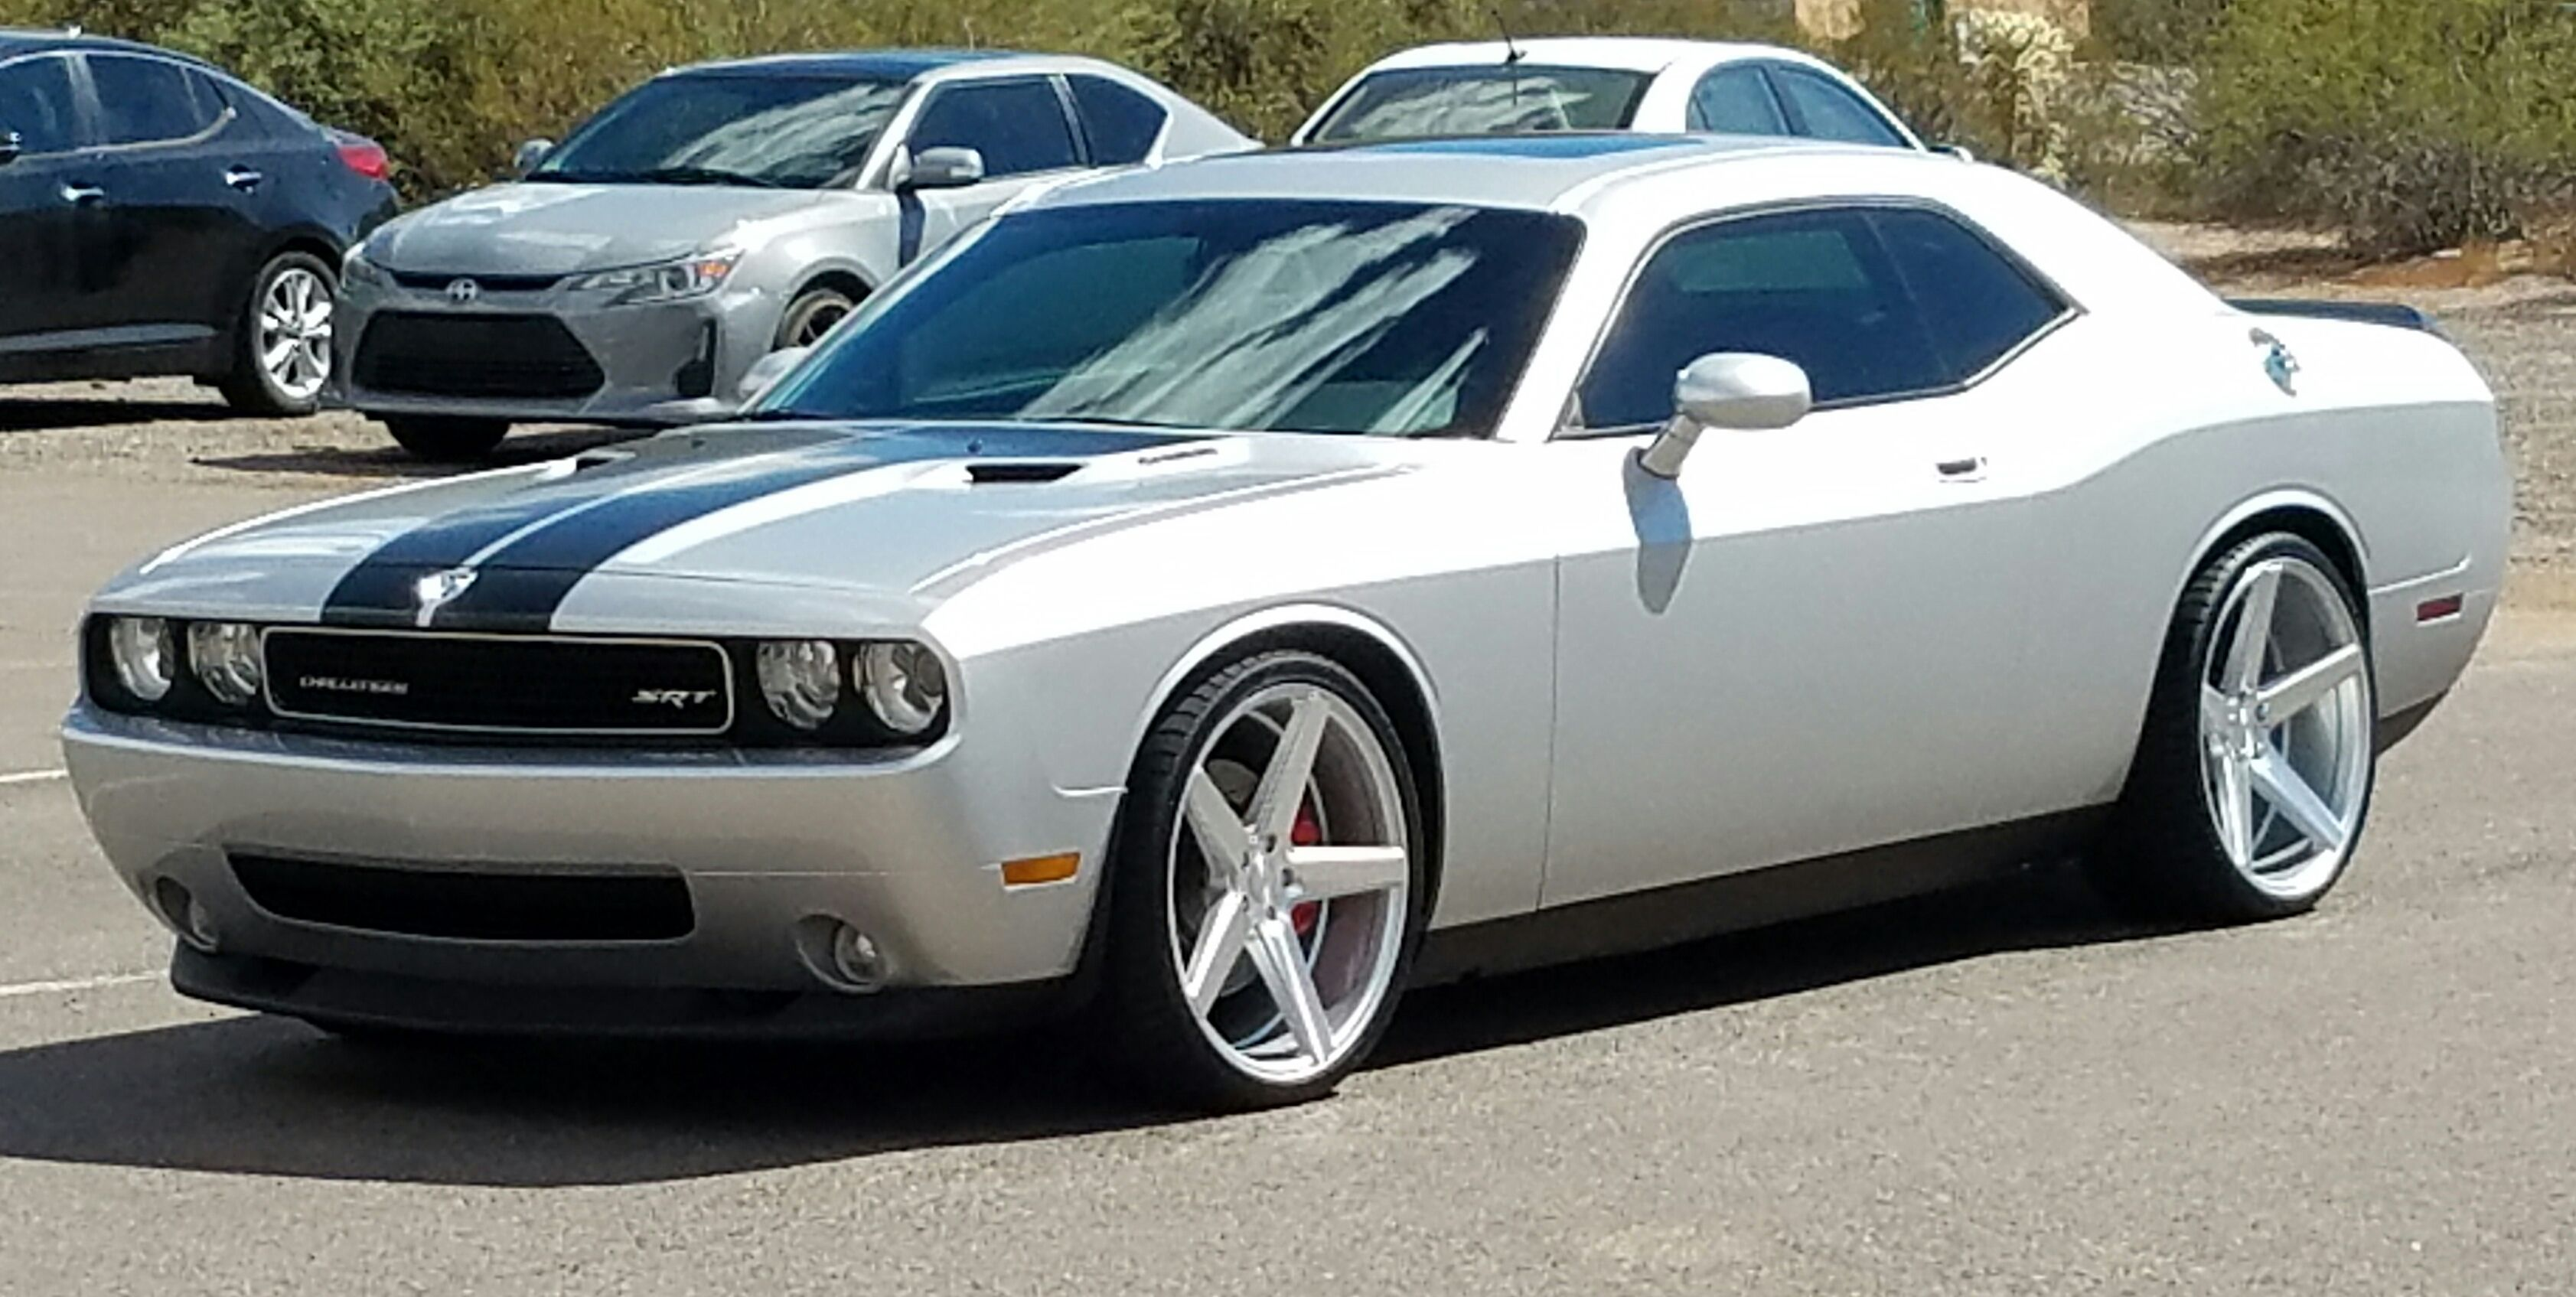 Silver 2009 Dodge Challenger Srt8 Kmc District Wheels 22 Inch